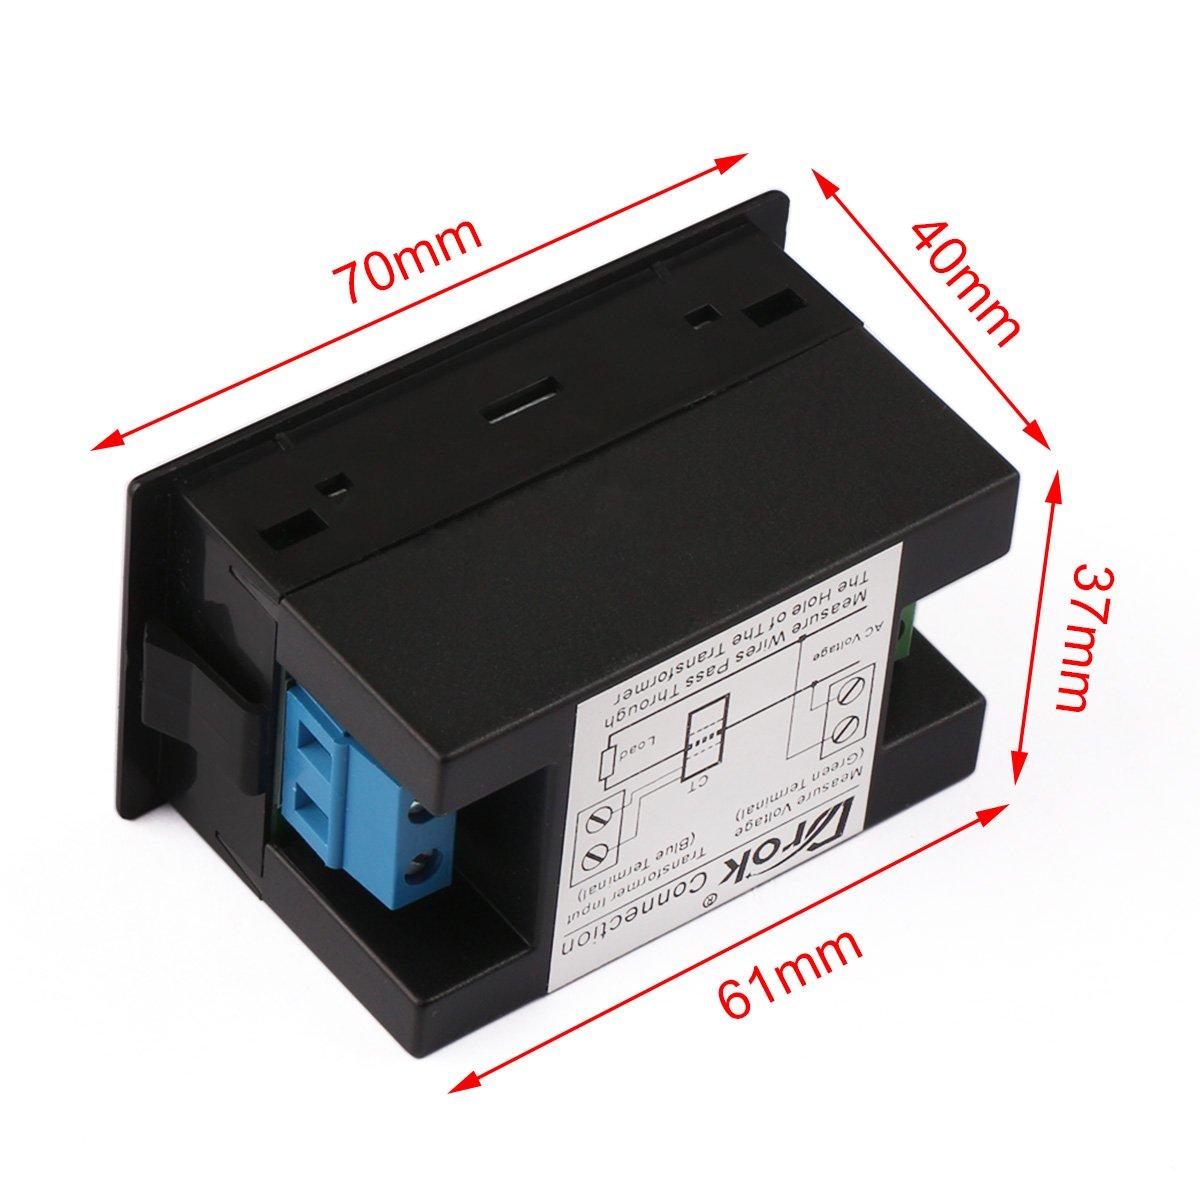 Isolation Transformer And Variac Setup Digital Volt Amp Meter Wiring Http Ecximages Amazoncom Images I 61 E83mtjfl Sl1200